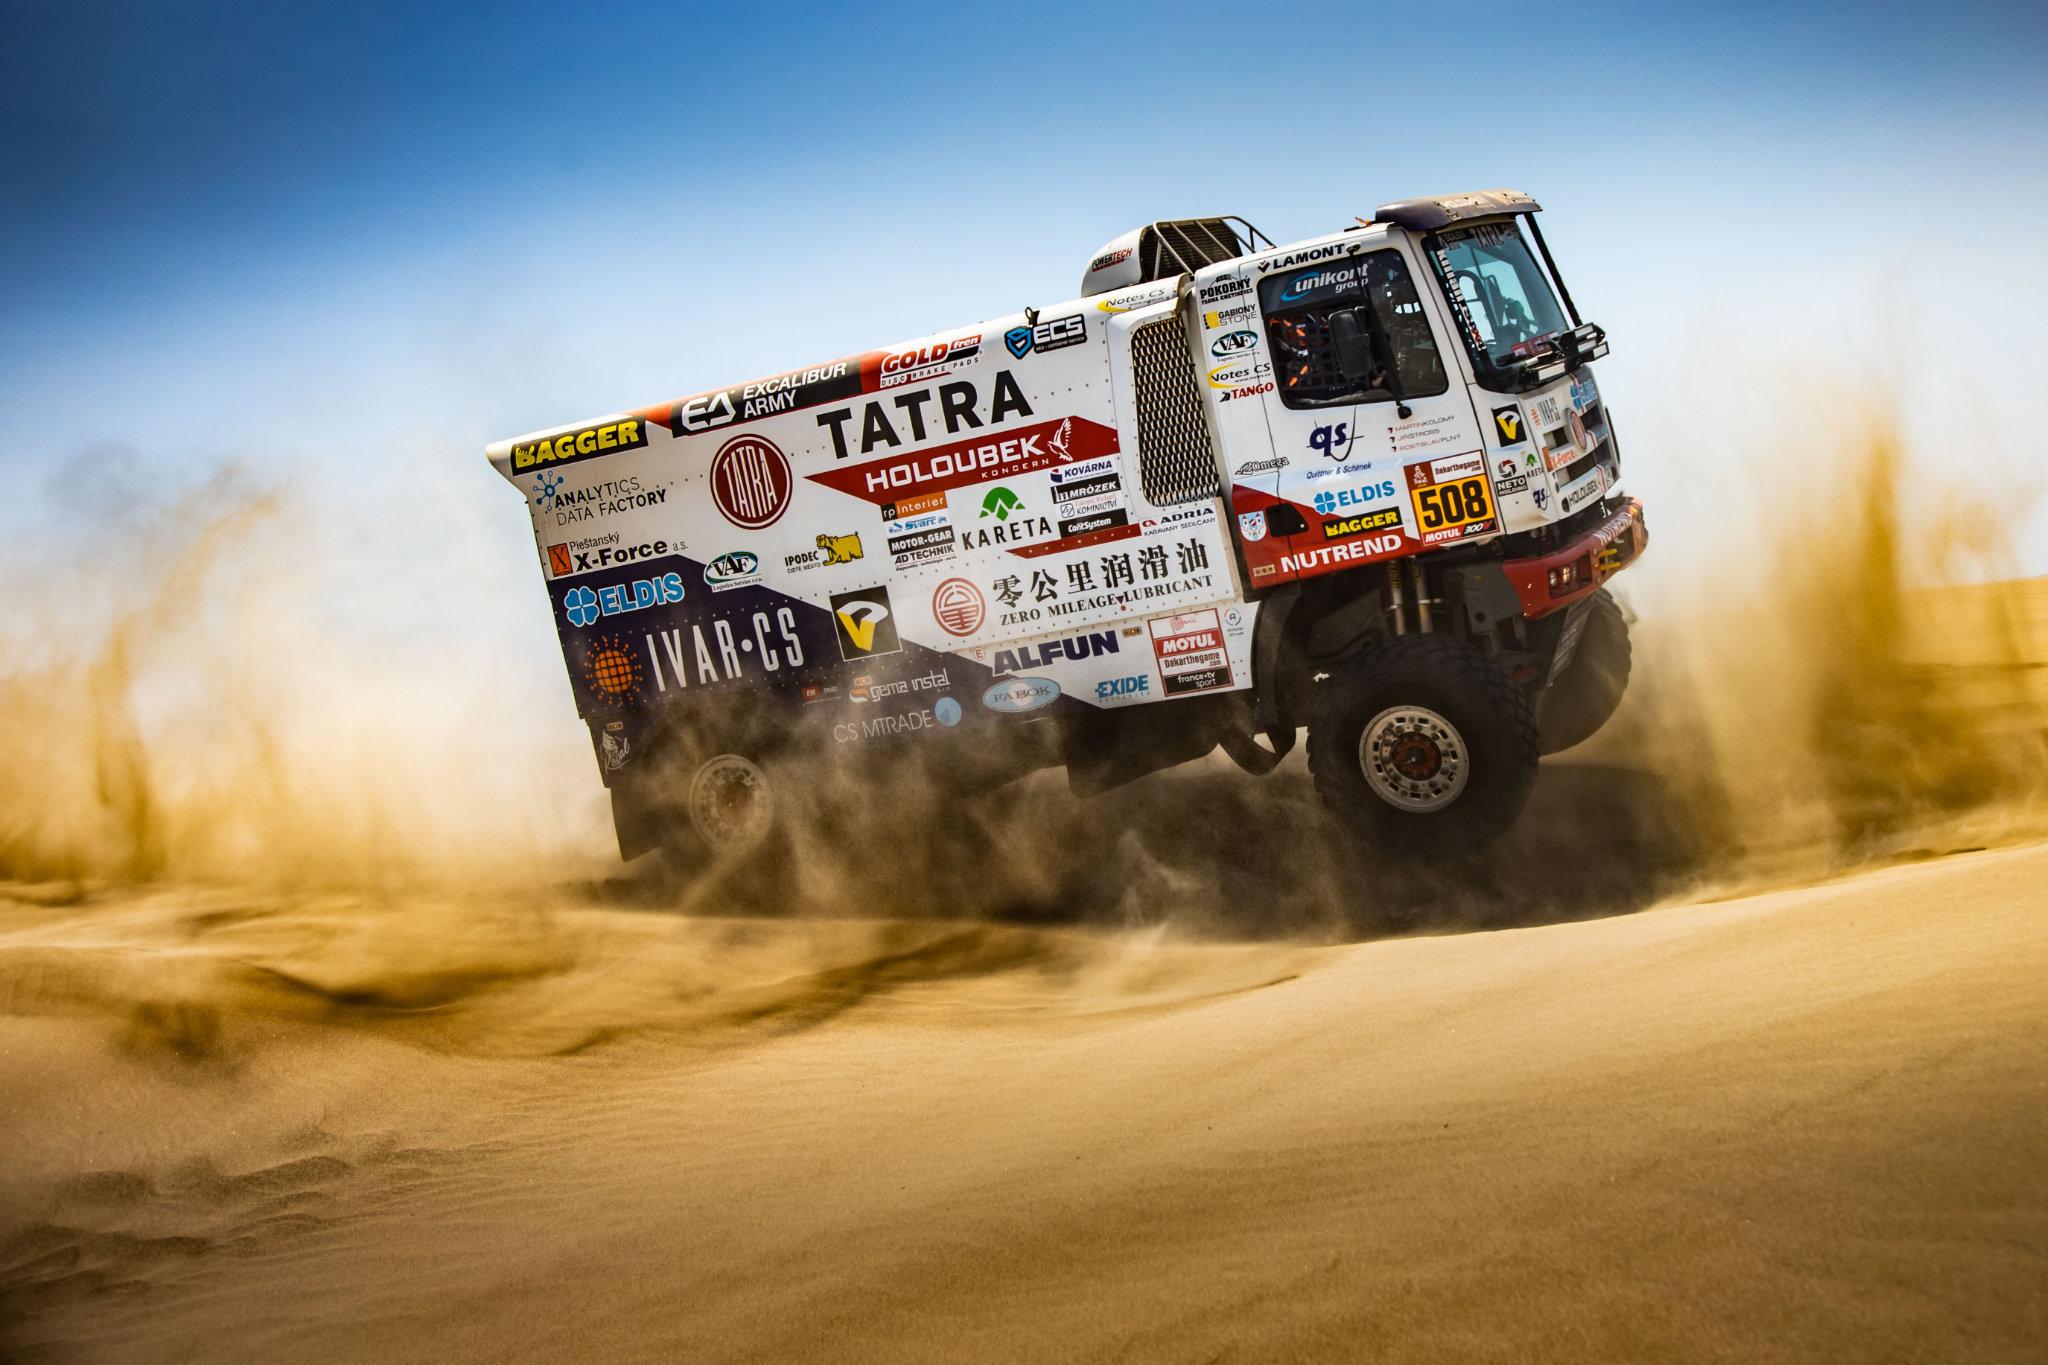 Martin Kolomý, Dakar 2019